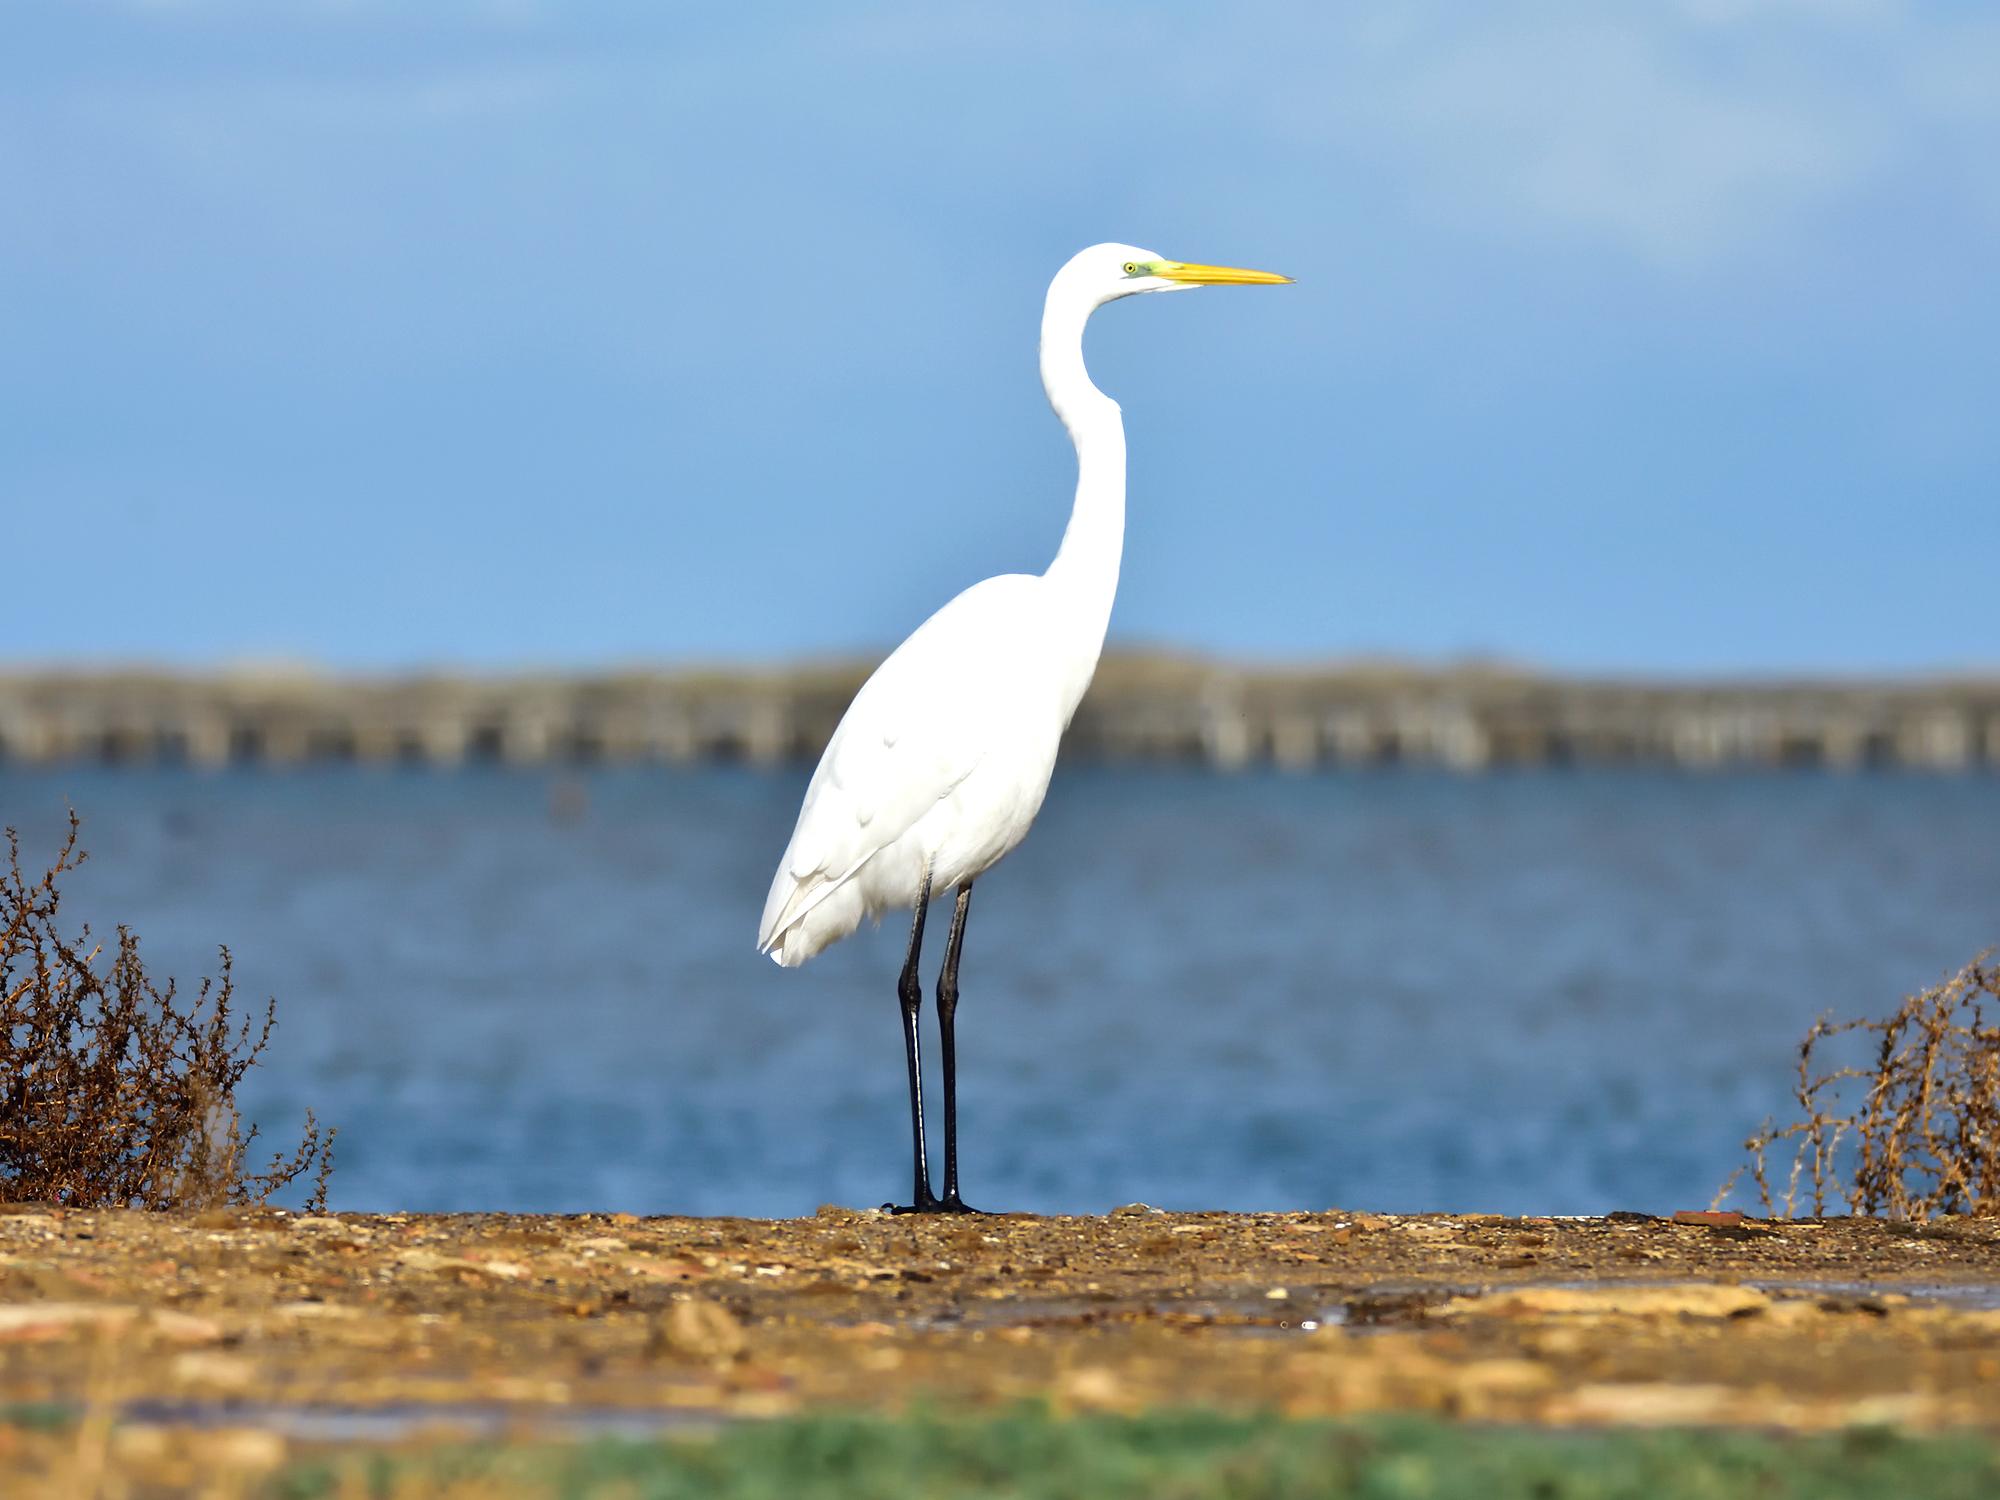 Birdwatching at Comporta